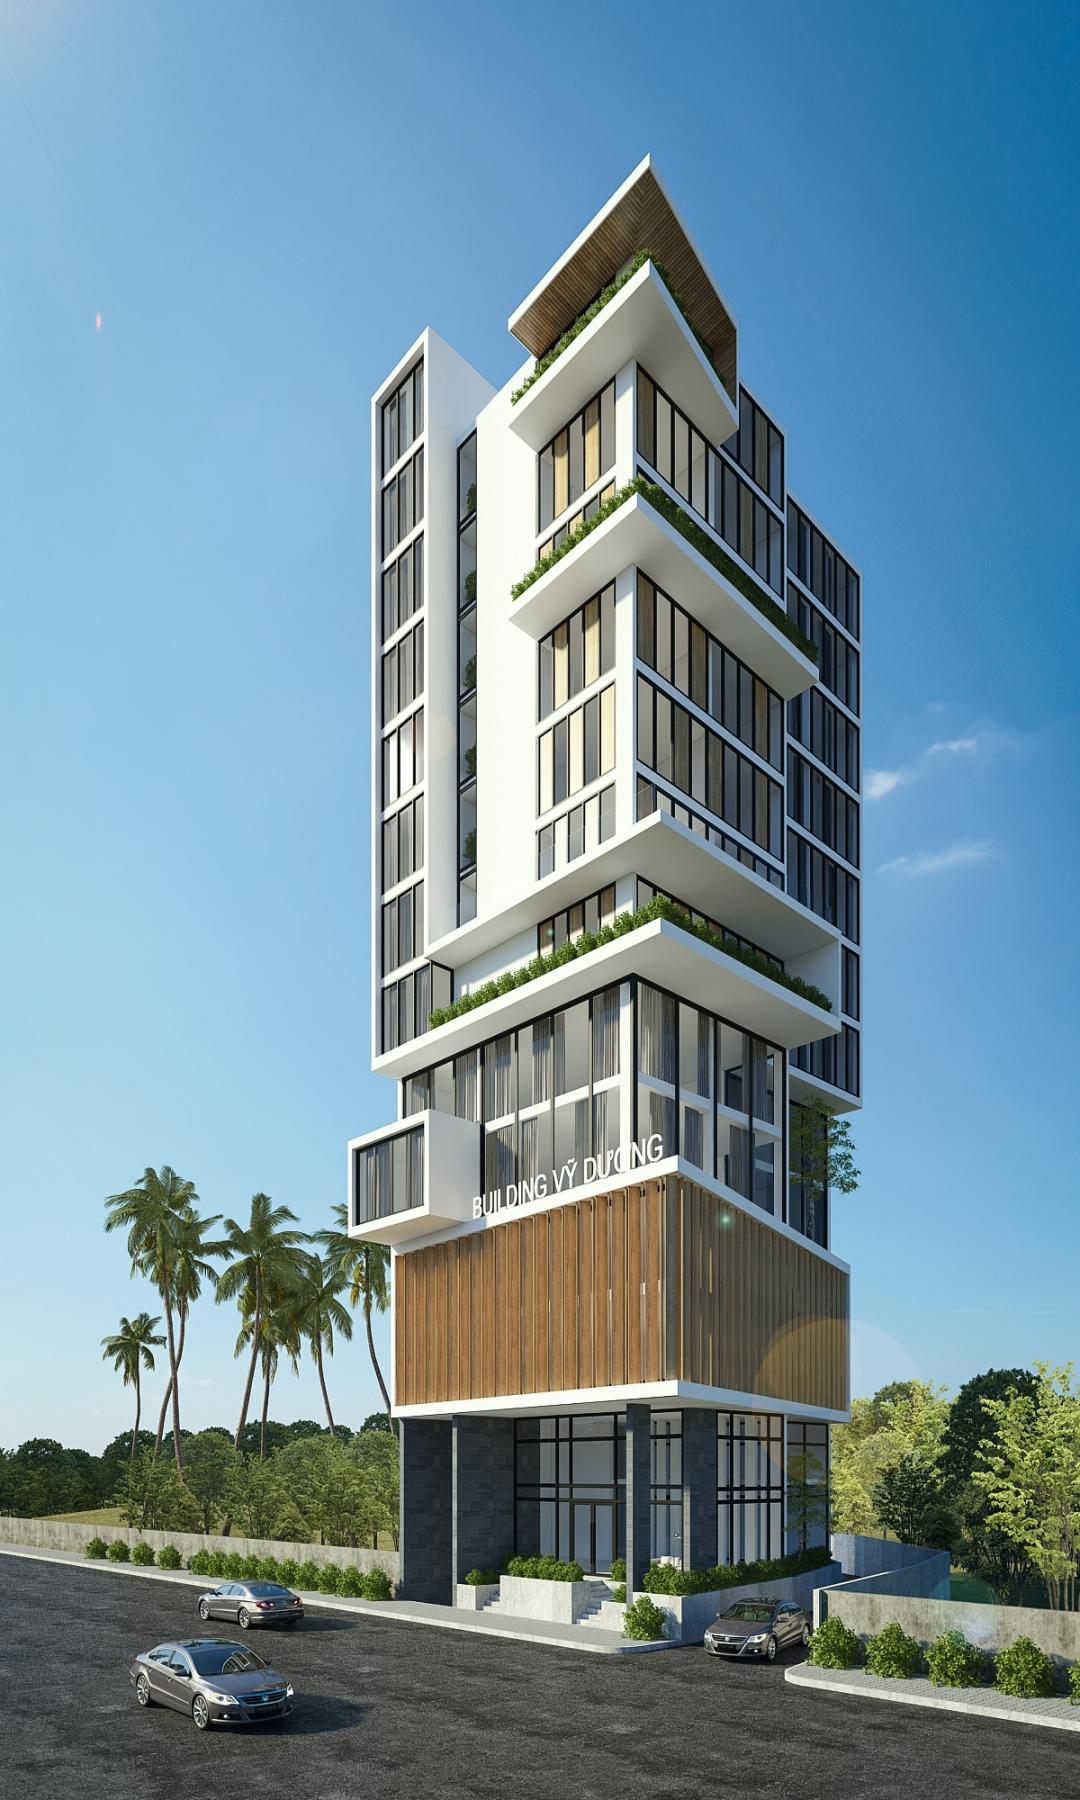 Building Vy Dương